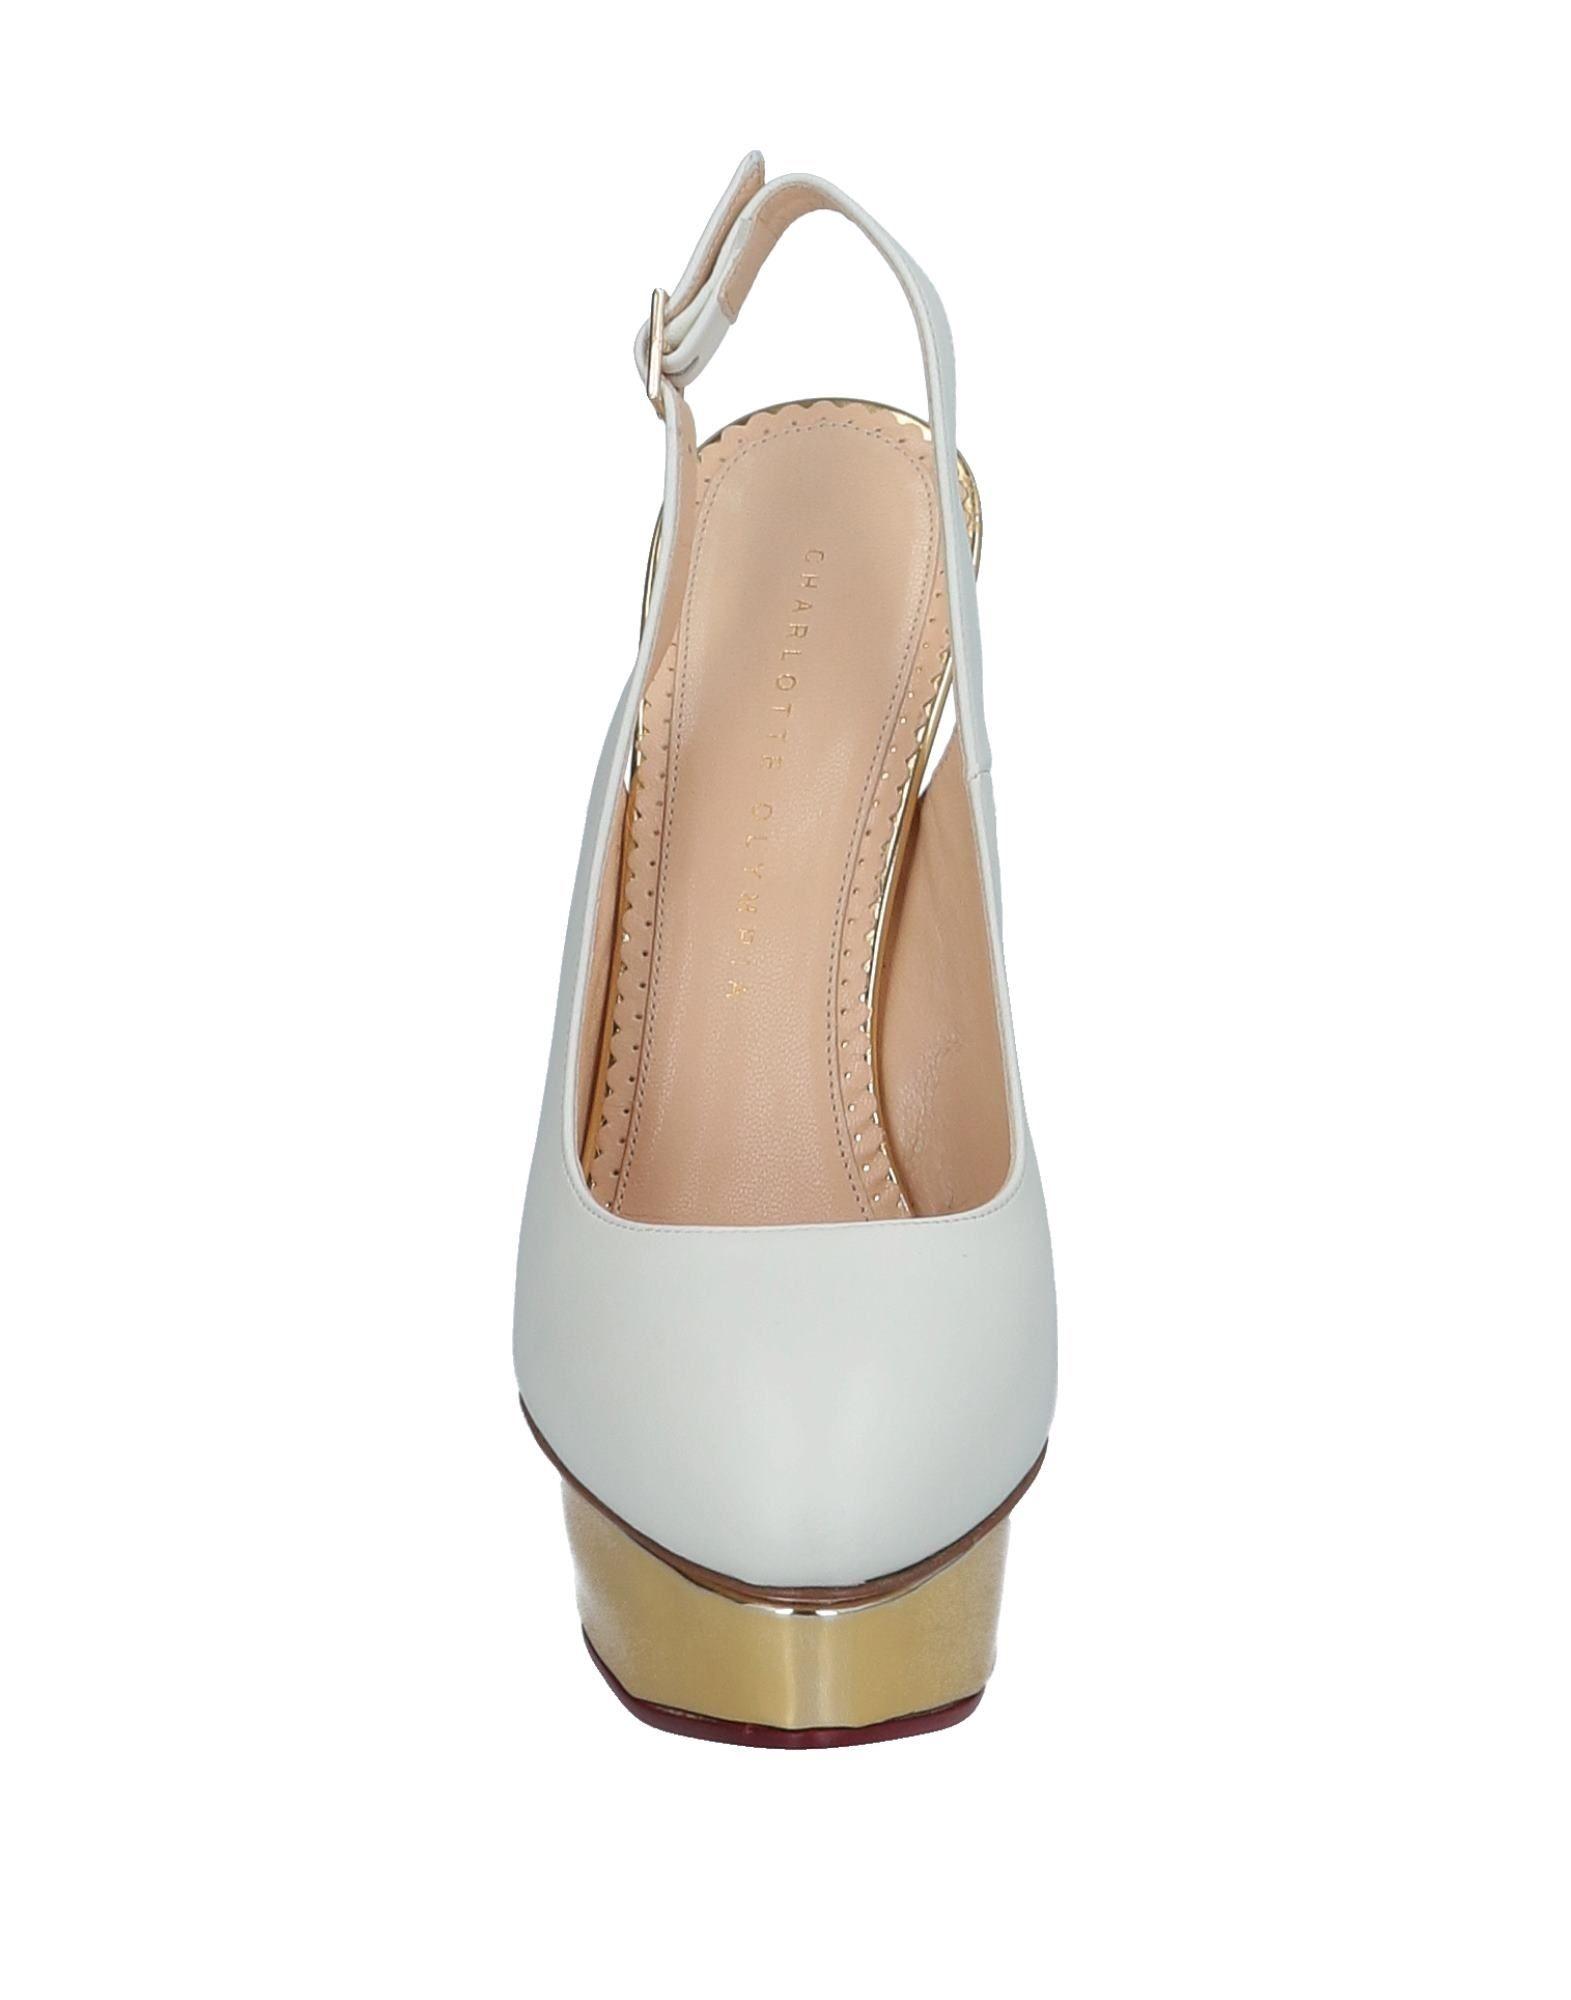 Rabatt Schuhe  Charlotte Olympia Pumps Damen  Schuhe 11544173AP 5e9302